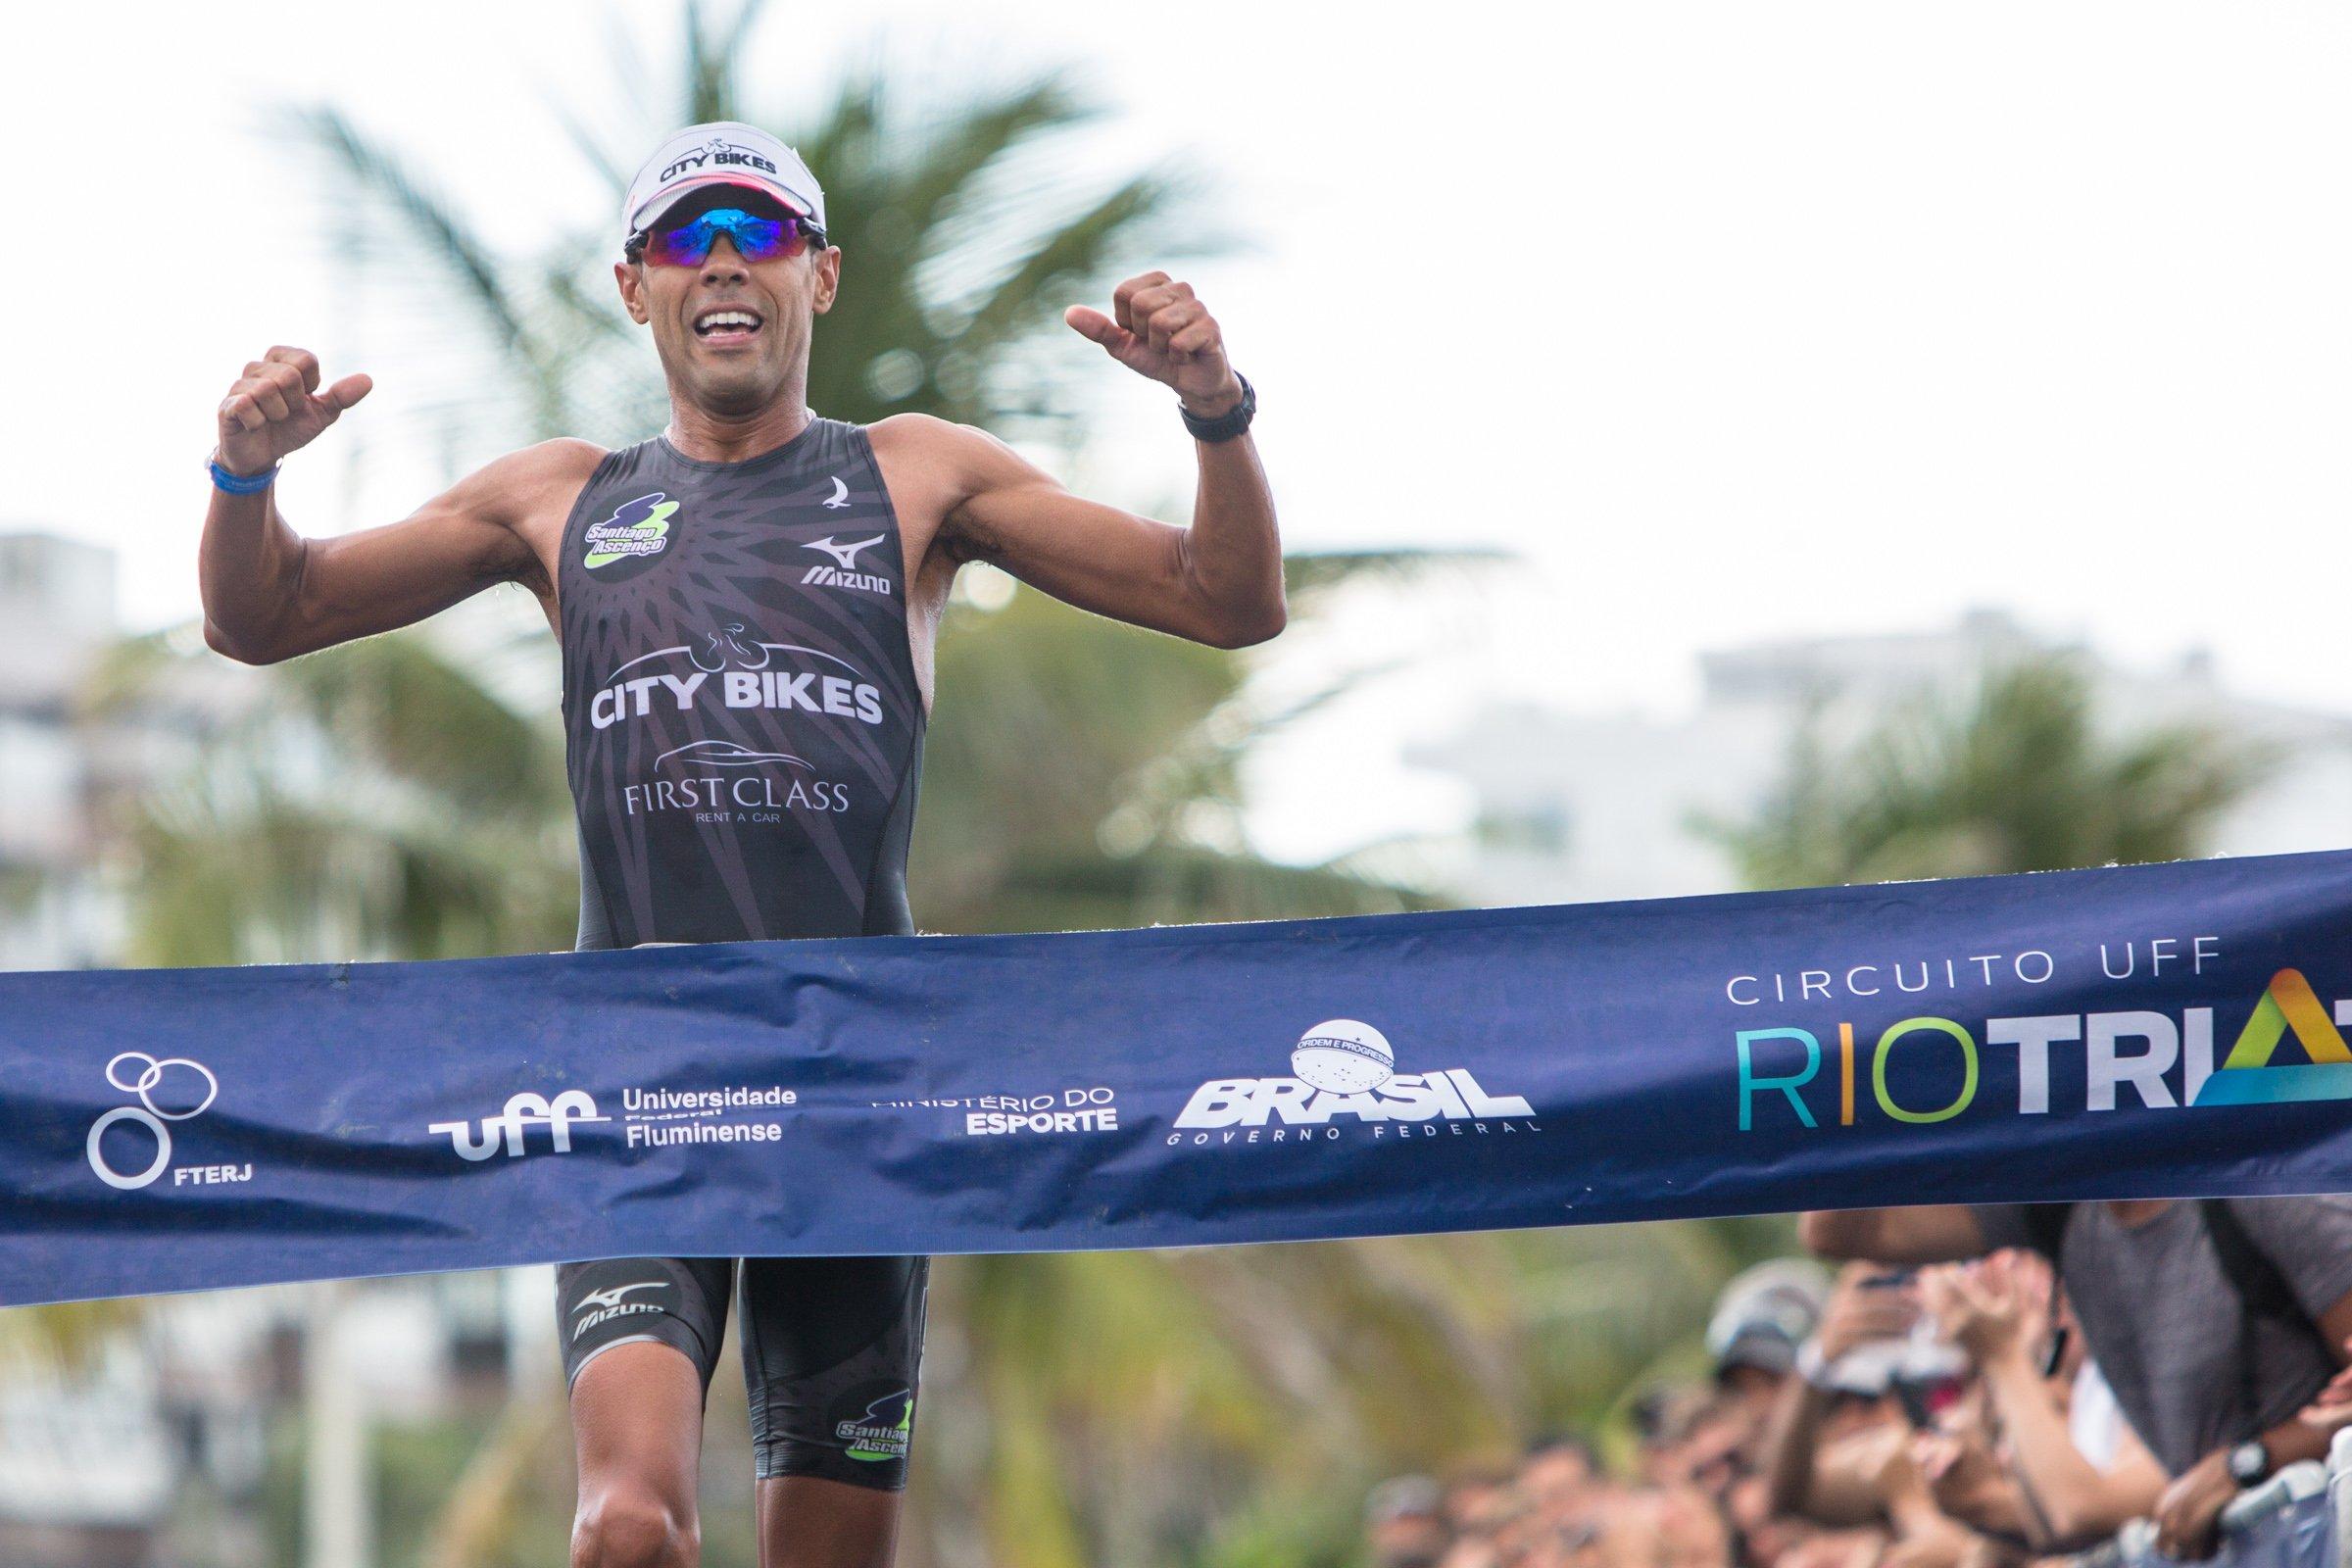 Circuito Uff Rio Triathlon : Santiago ascenço e bia neres vencem ª etapa do circuito